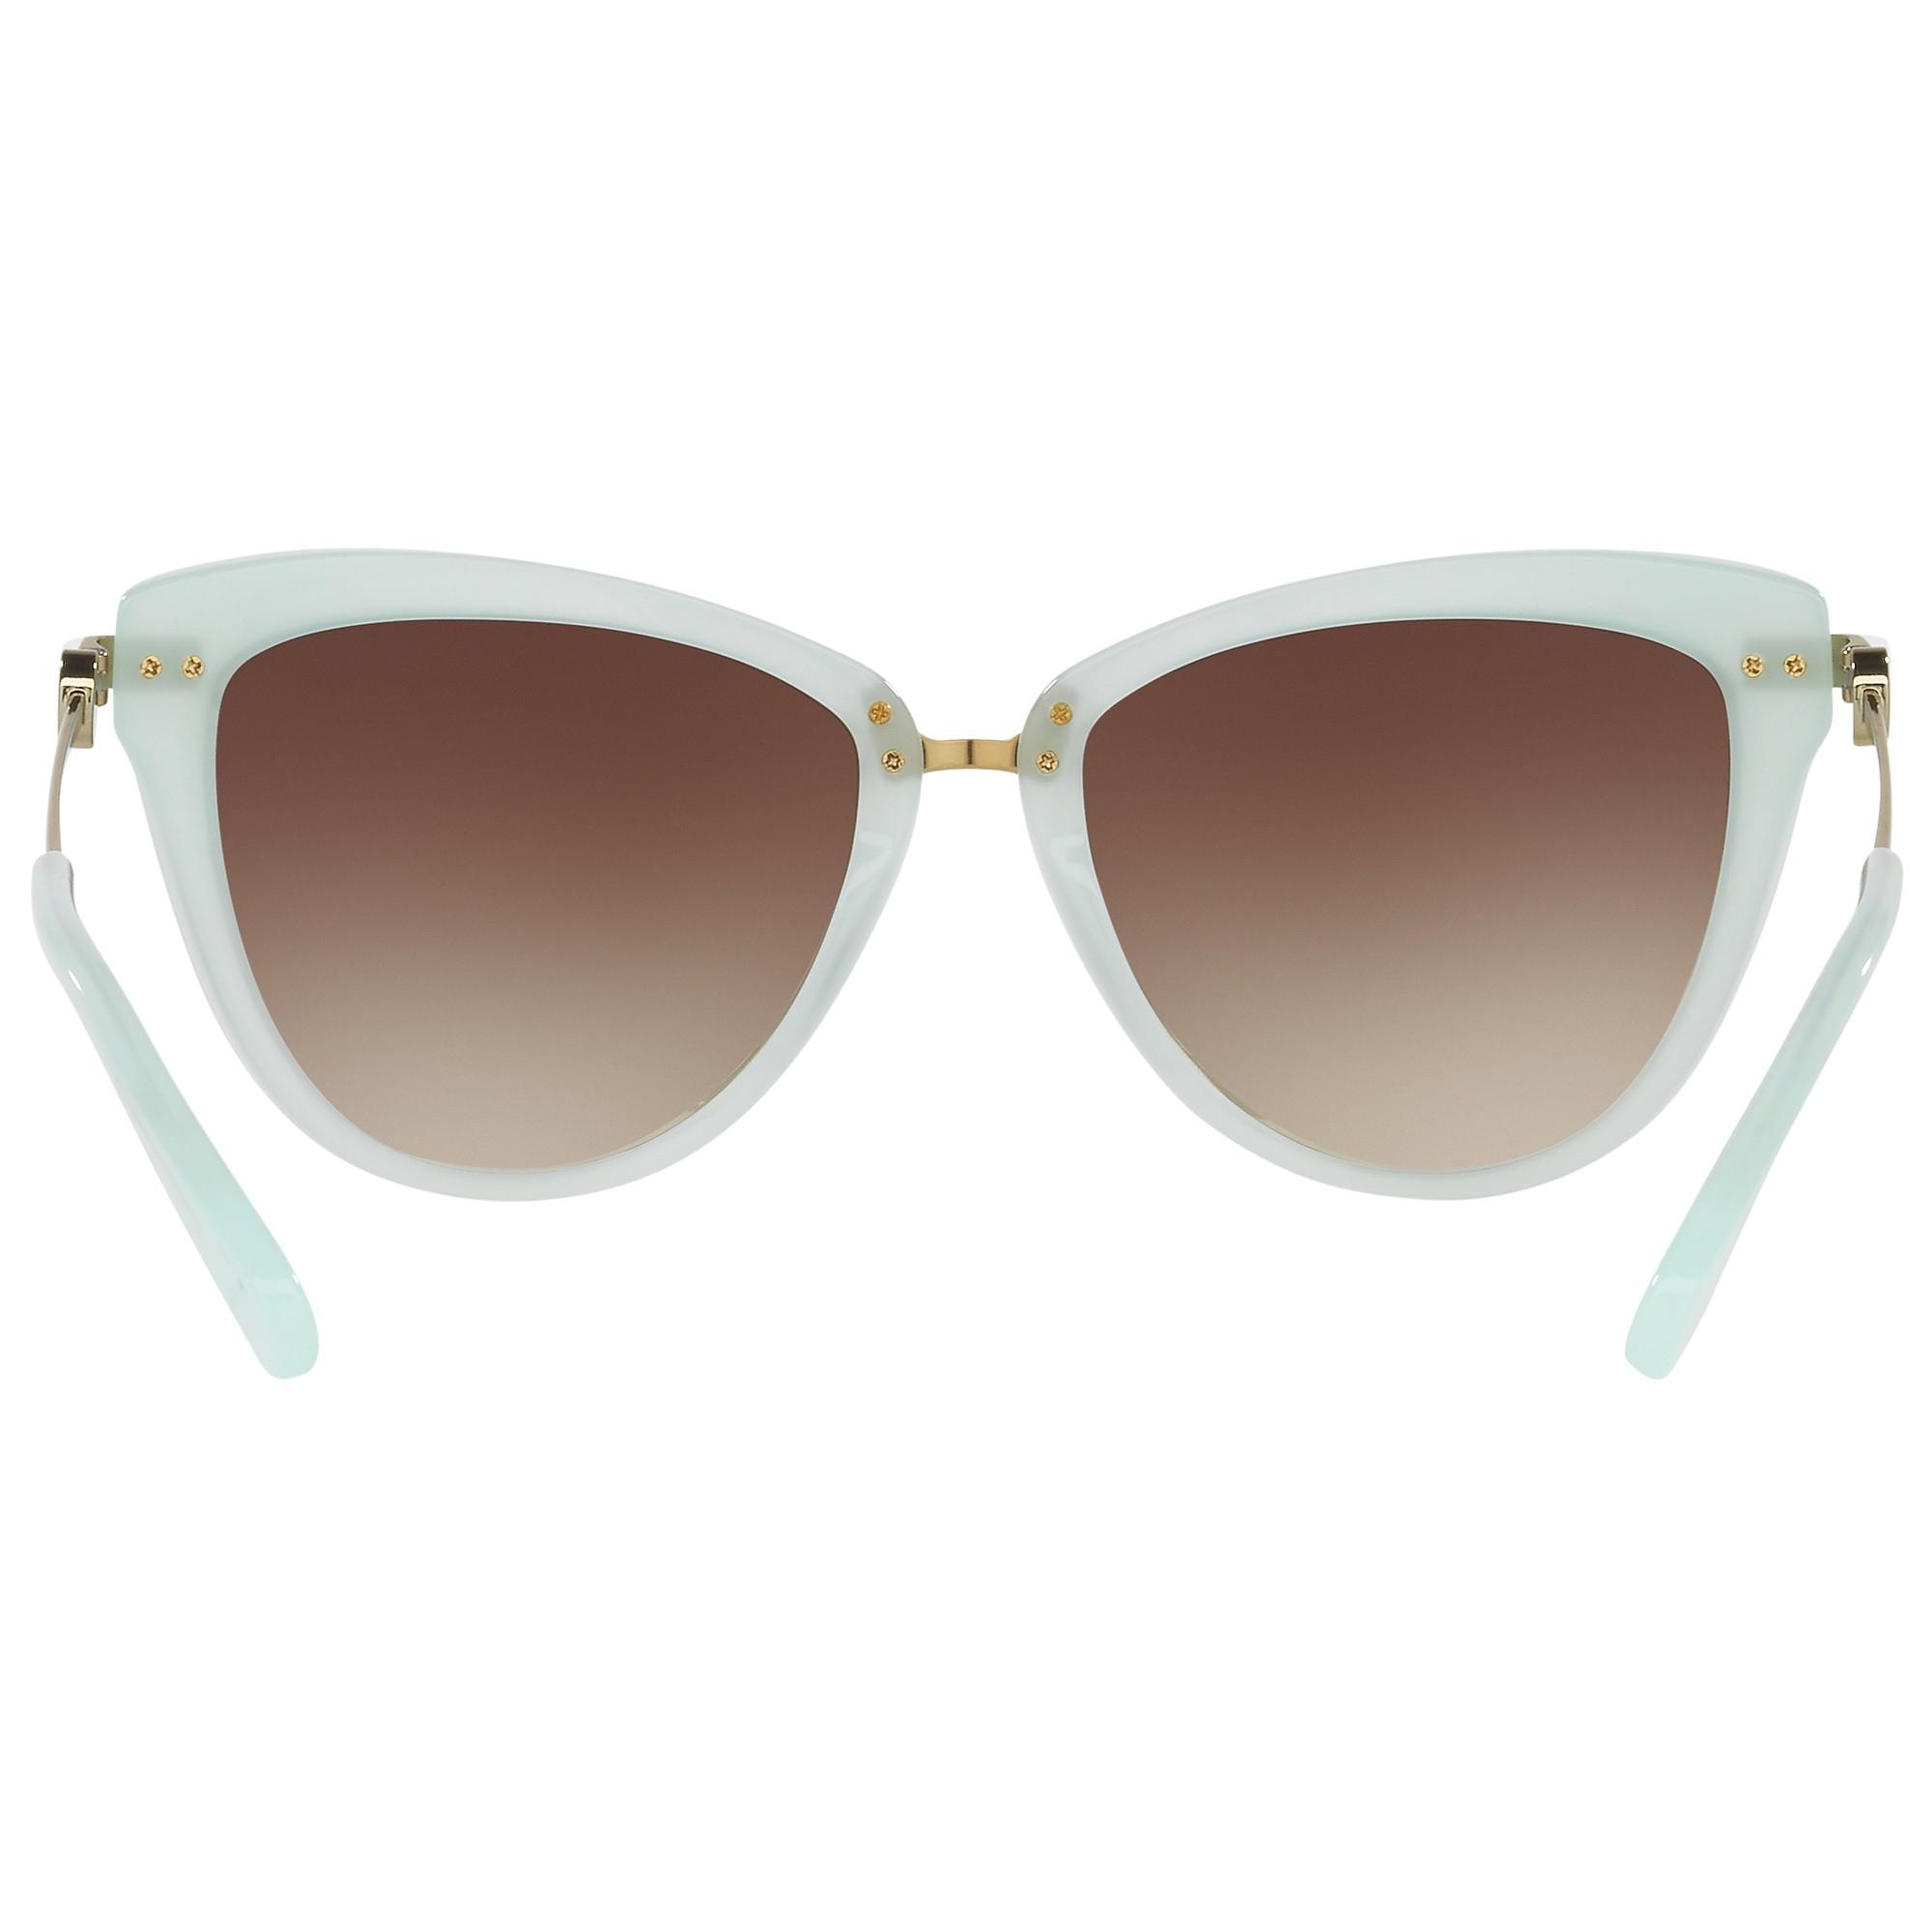 6681b6207d4 Michael Kors Mk6039 Abela Ii Cat s Eye Sunglasses in Green - Lyst